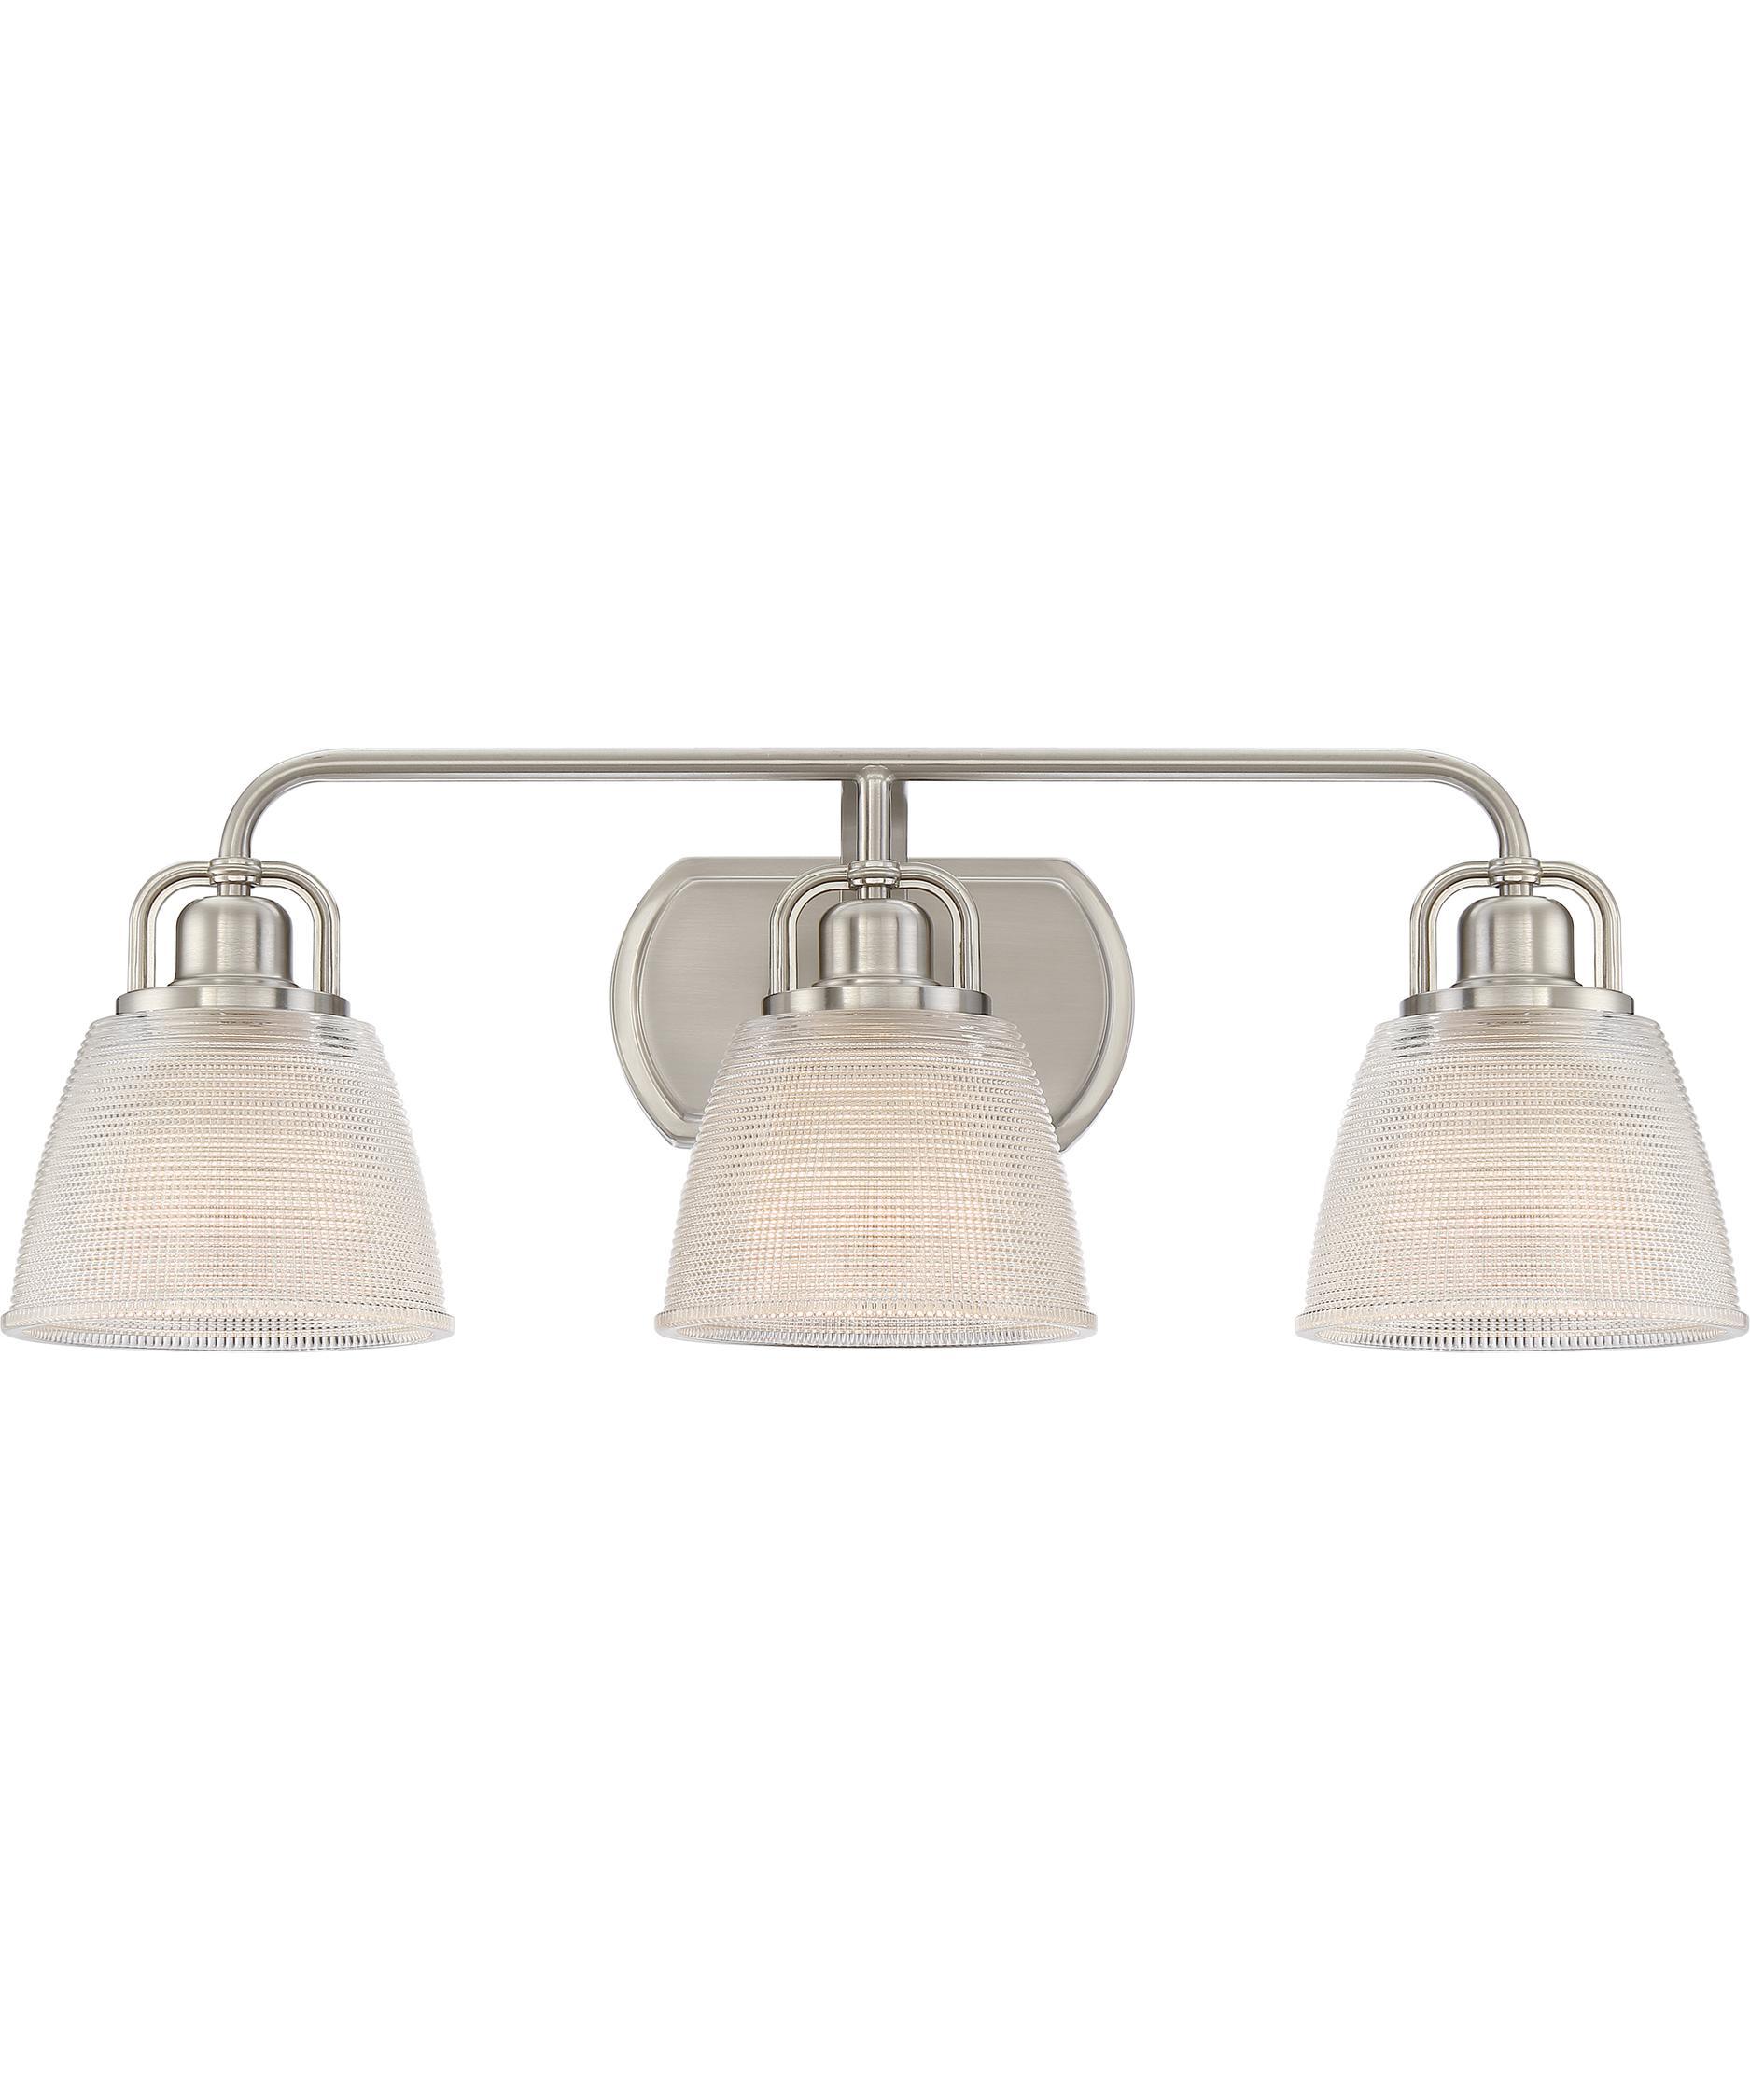 quoizel dublin 25 inch wide bath vanity light | capitol lighting 1